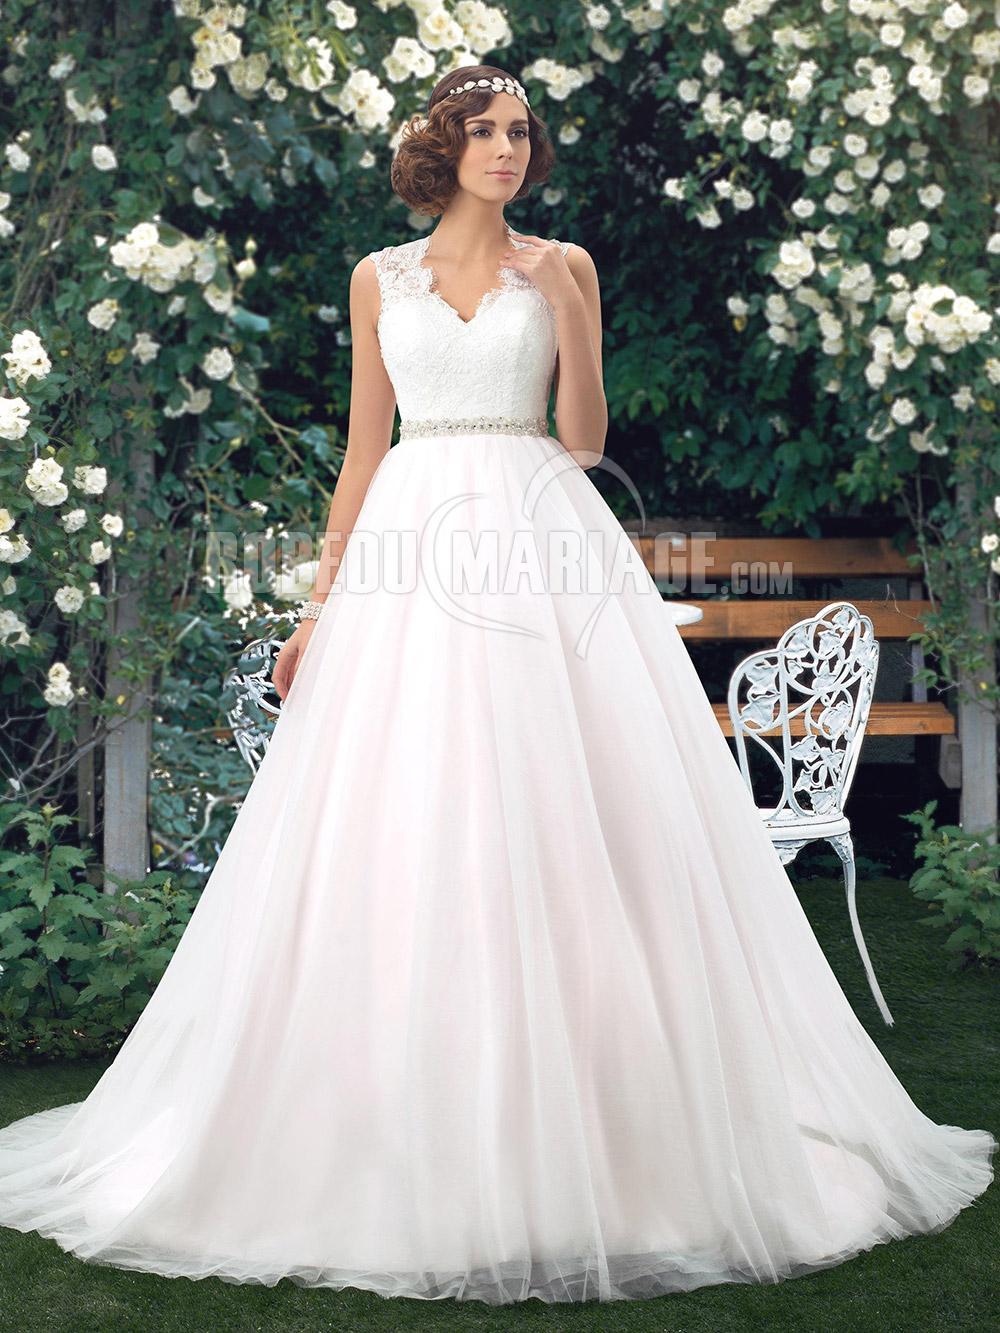 col en v robe de mari e enceinte en dentelle et tulle pas cher robe2012608. Black Bedroom Furniture Sets. Home Design Ideas